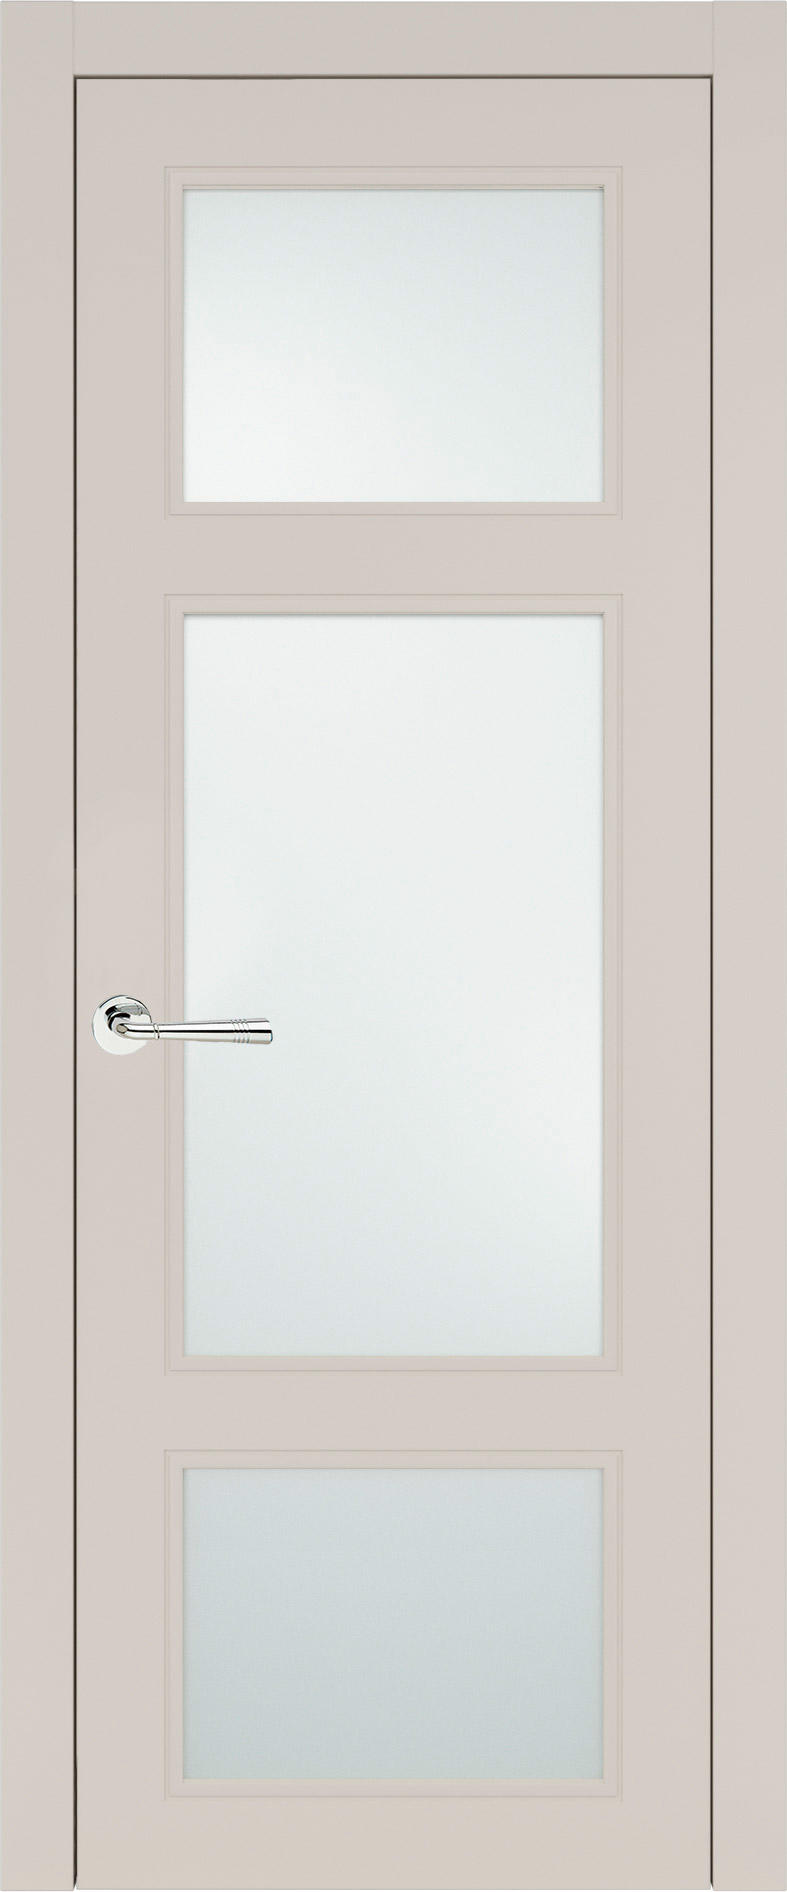 Siena Neo Classic цвет - Жемчужная эмаль (RAL 1013) Со стеклом (ДО)